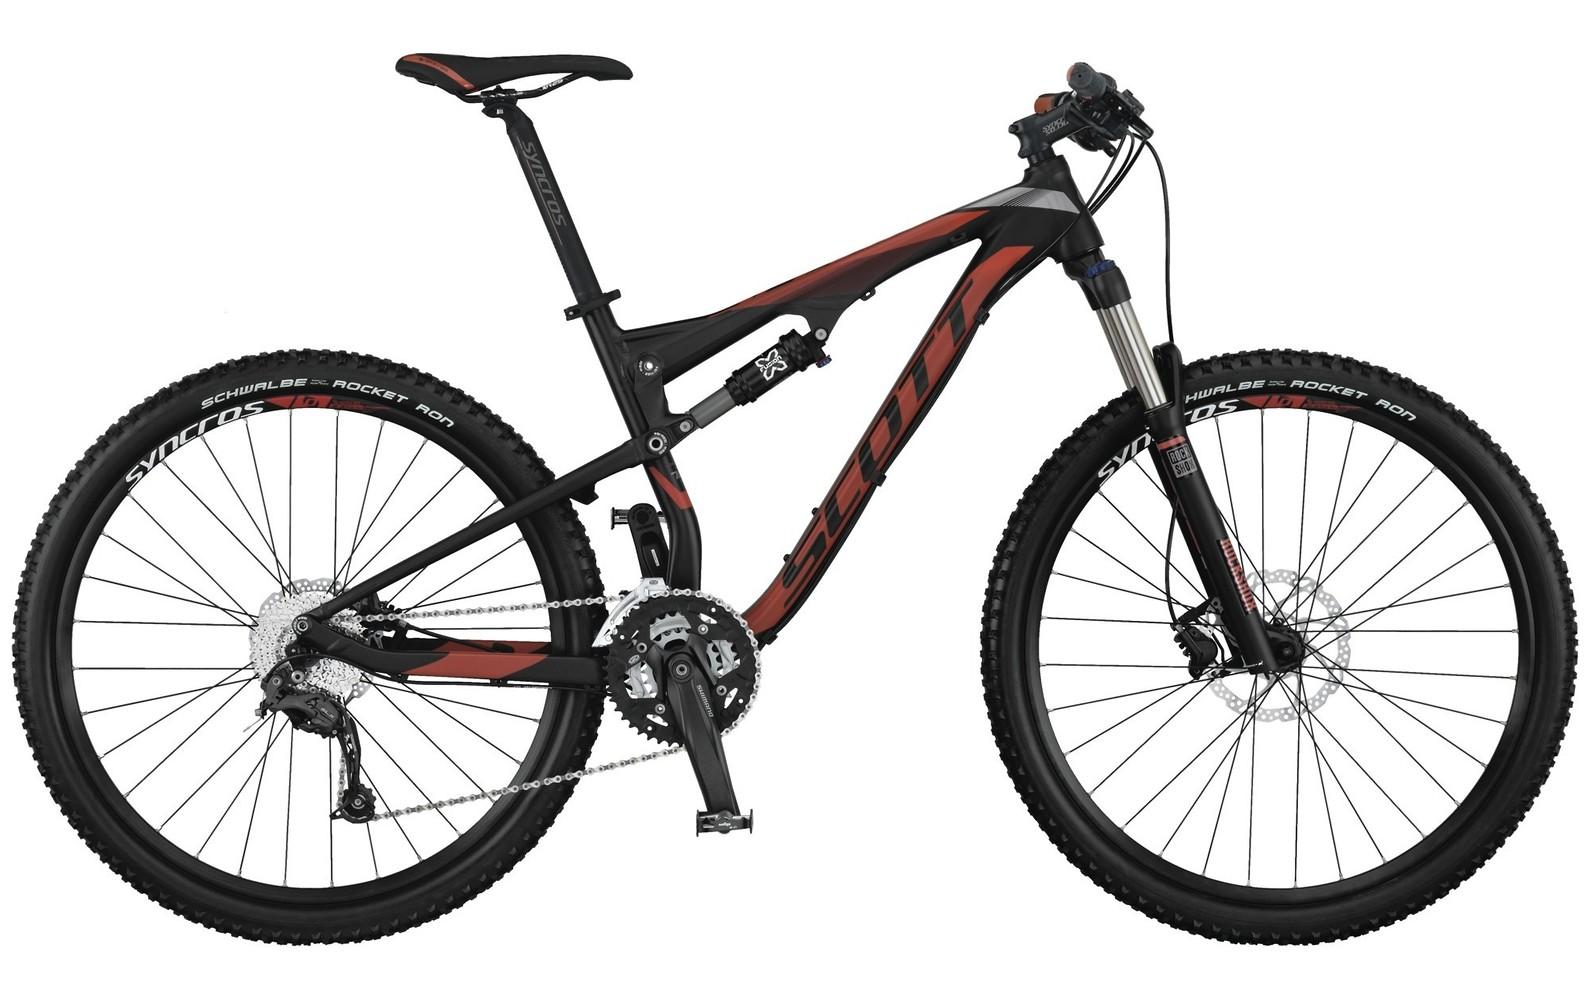 SCOTT Spark 760 Bike